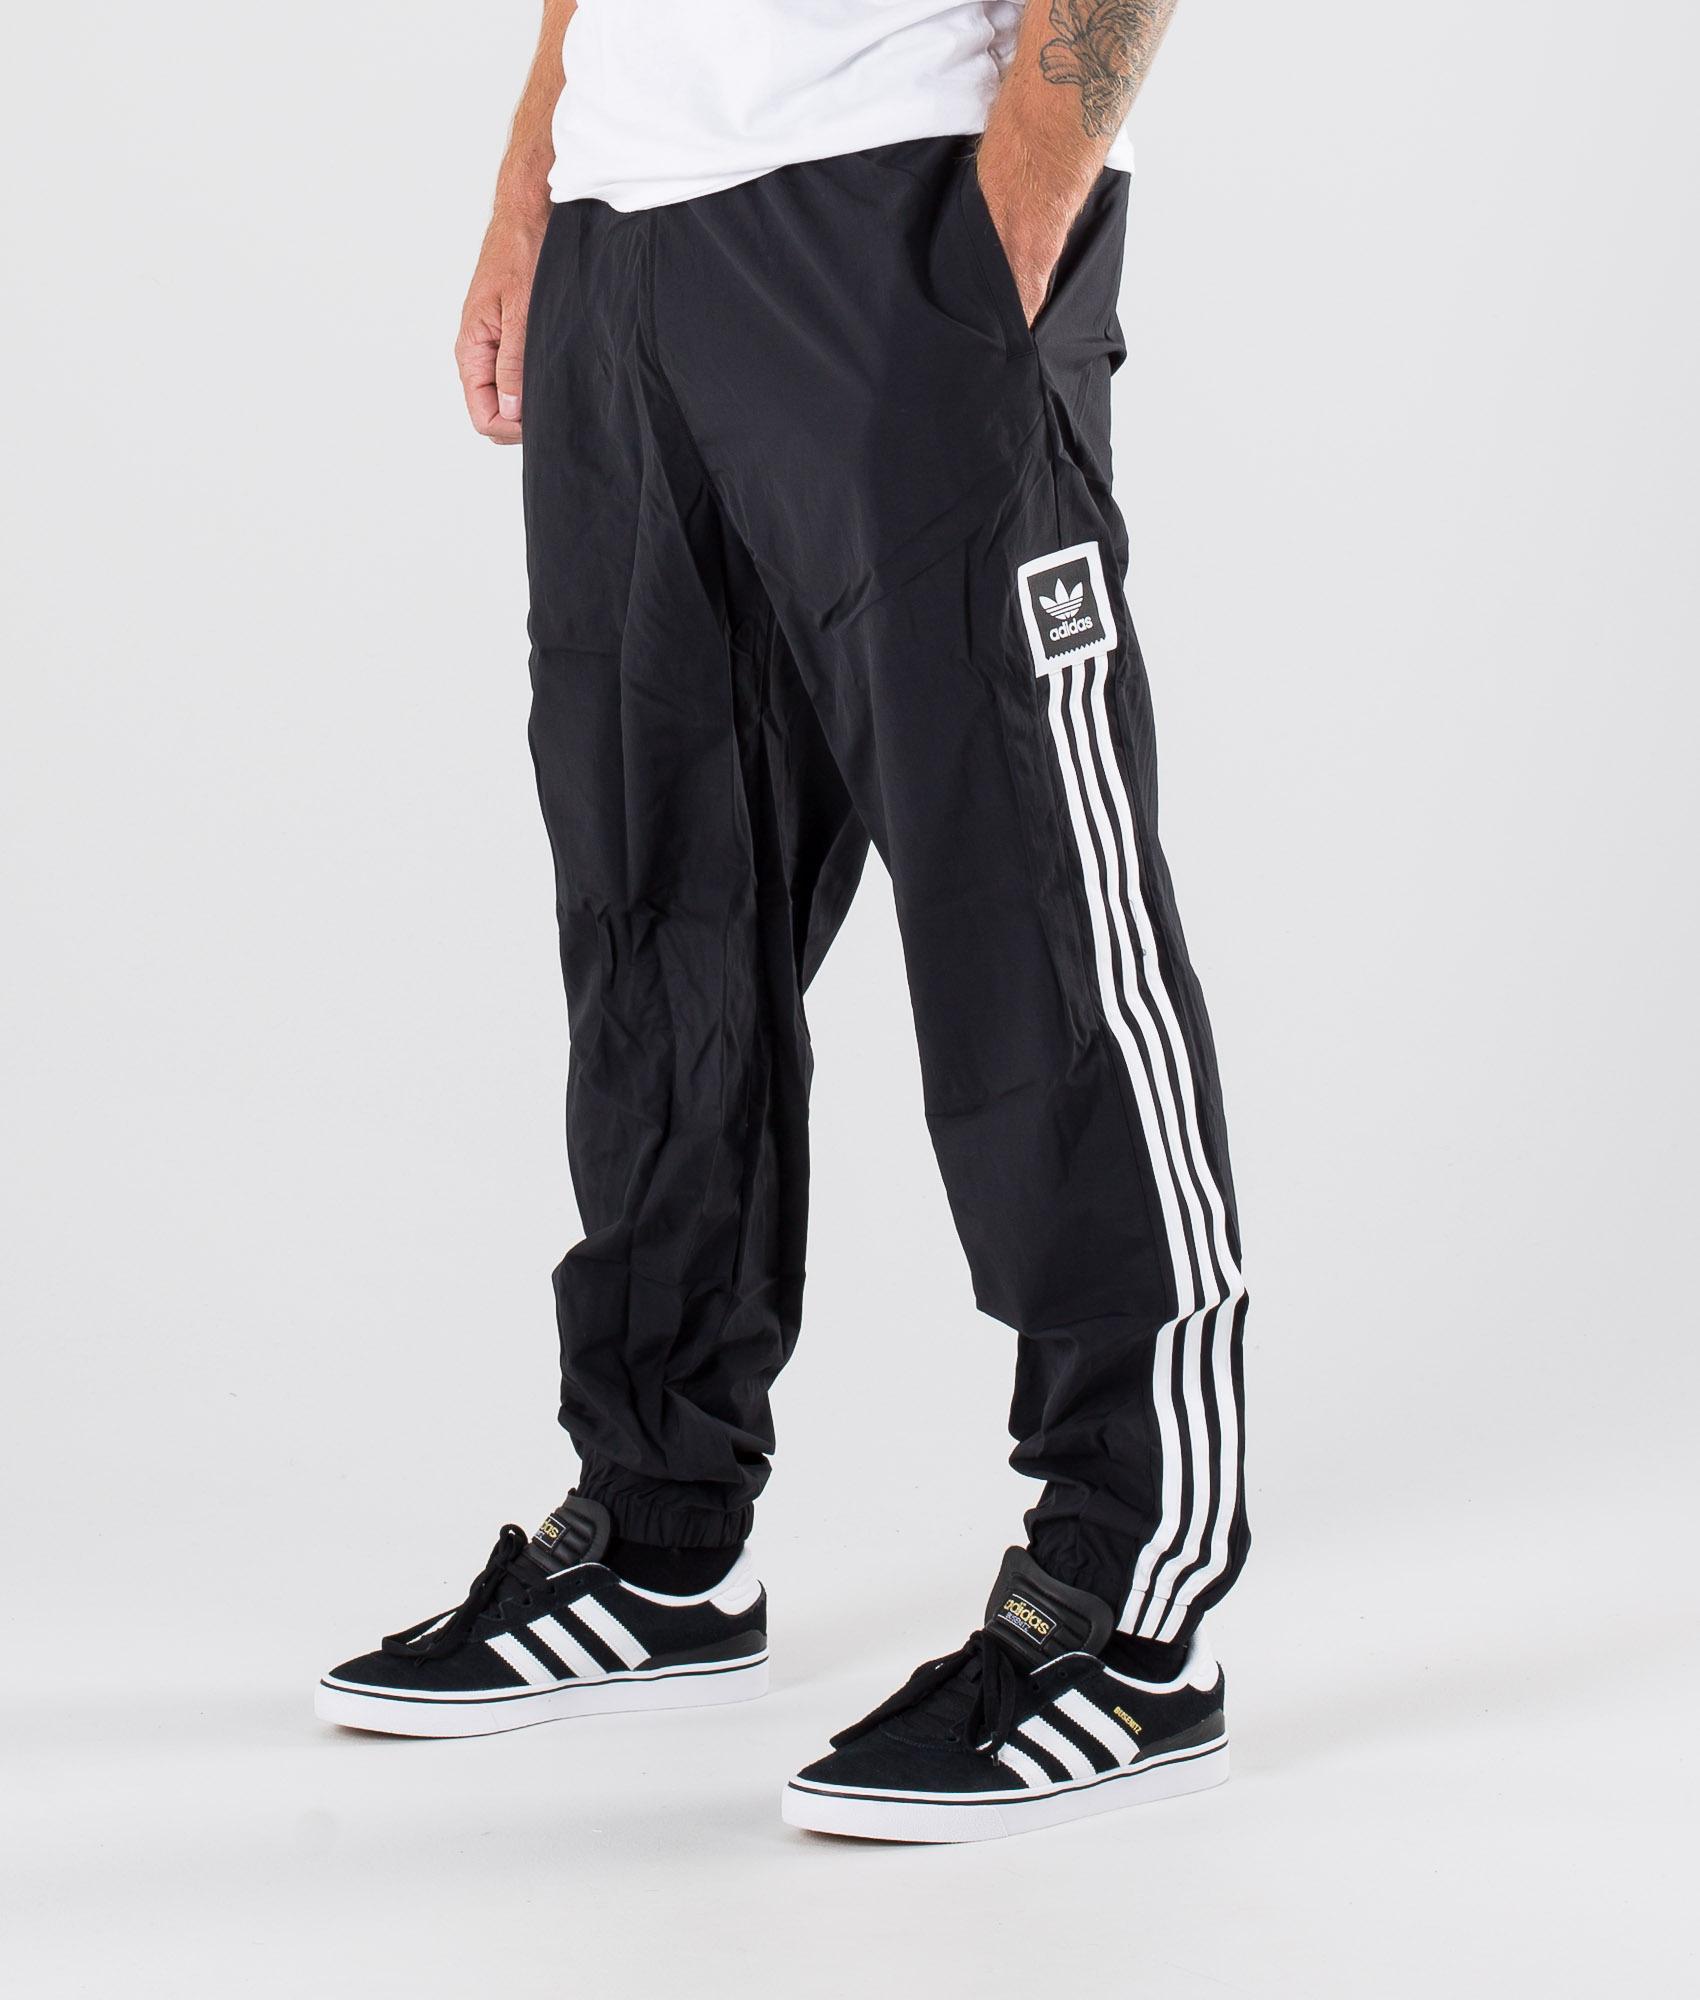 Adidas Skateboarding | Insley Sp de chez Pantalon Medium